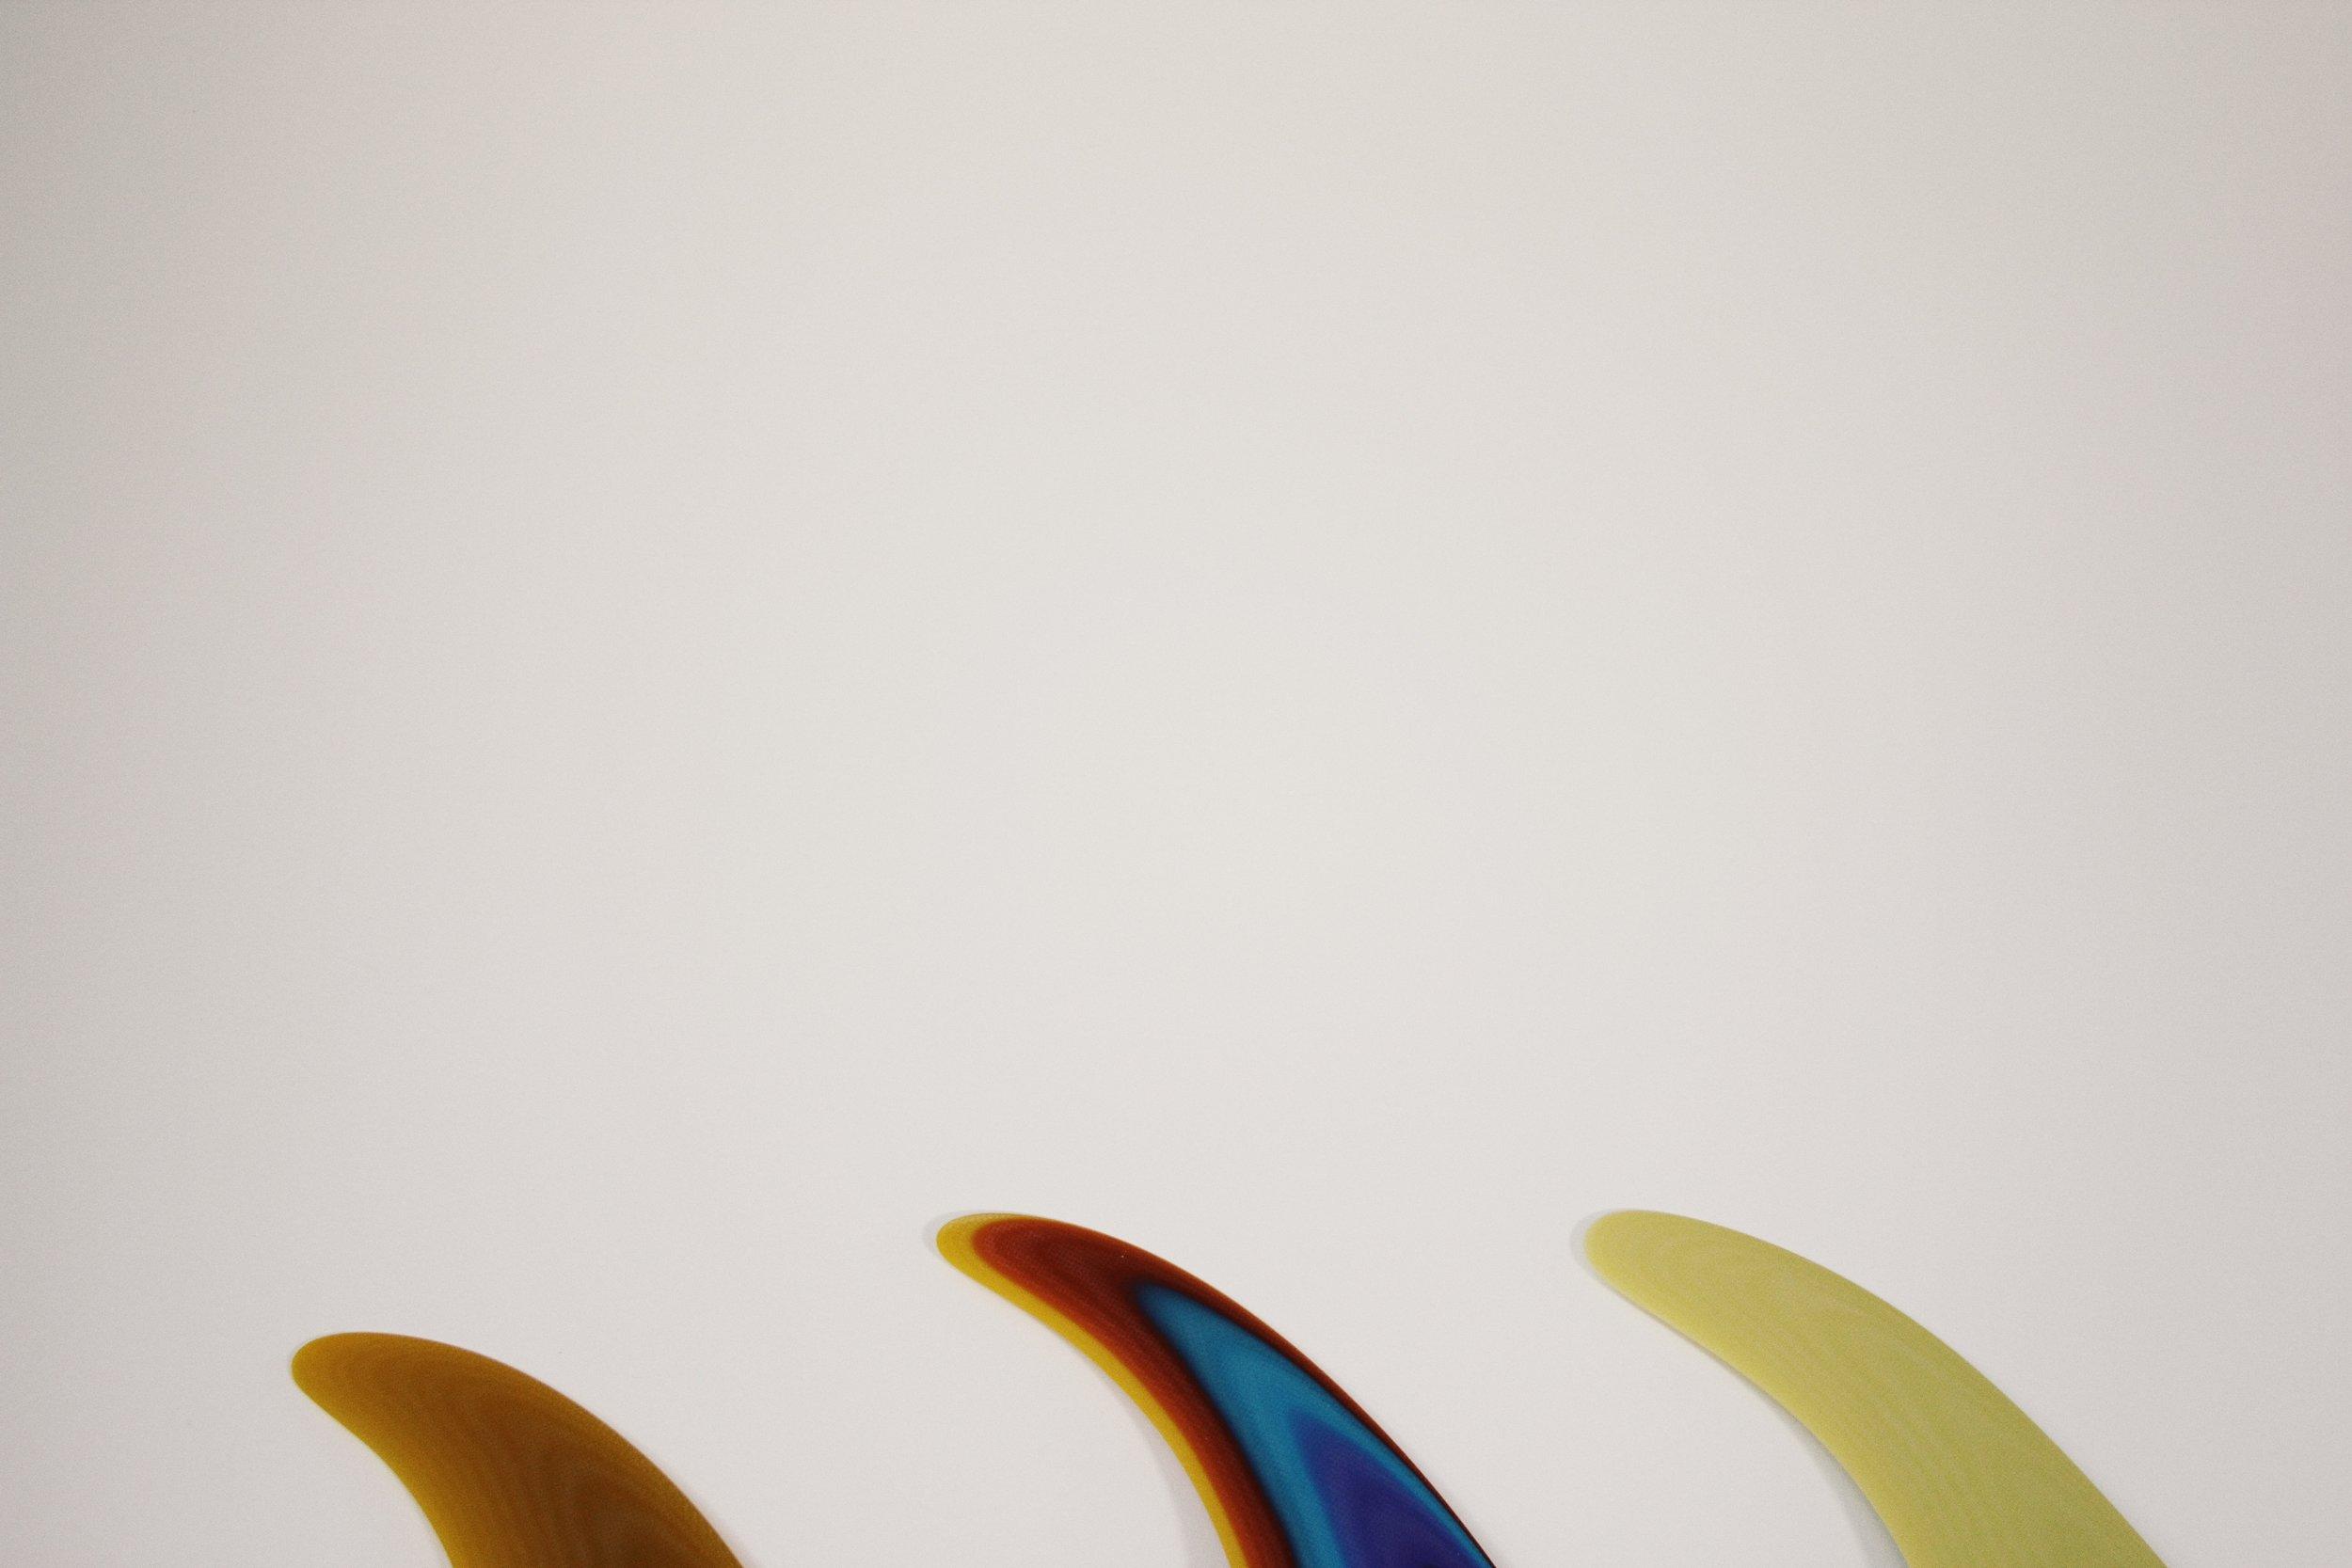 SURF SHOP_7a.jpg